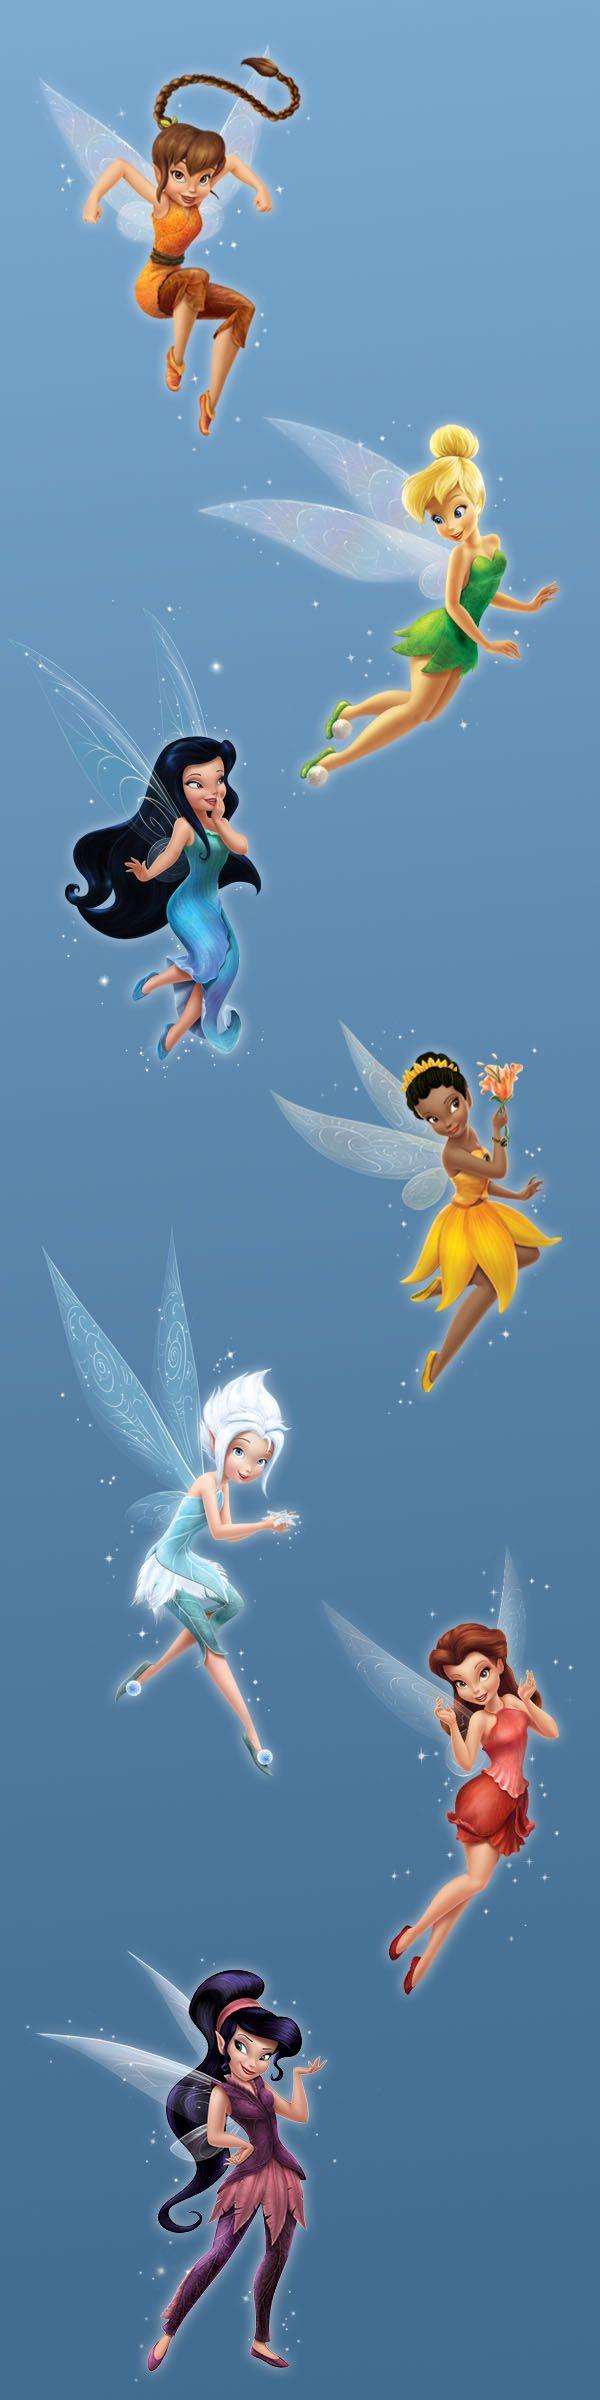 Fawn, Tinker Bell, Silvermist, Iridessa, Periwinkle, Rosetta and Vidia.